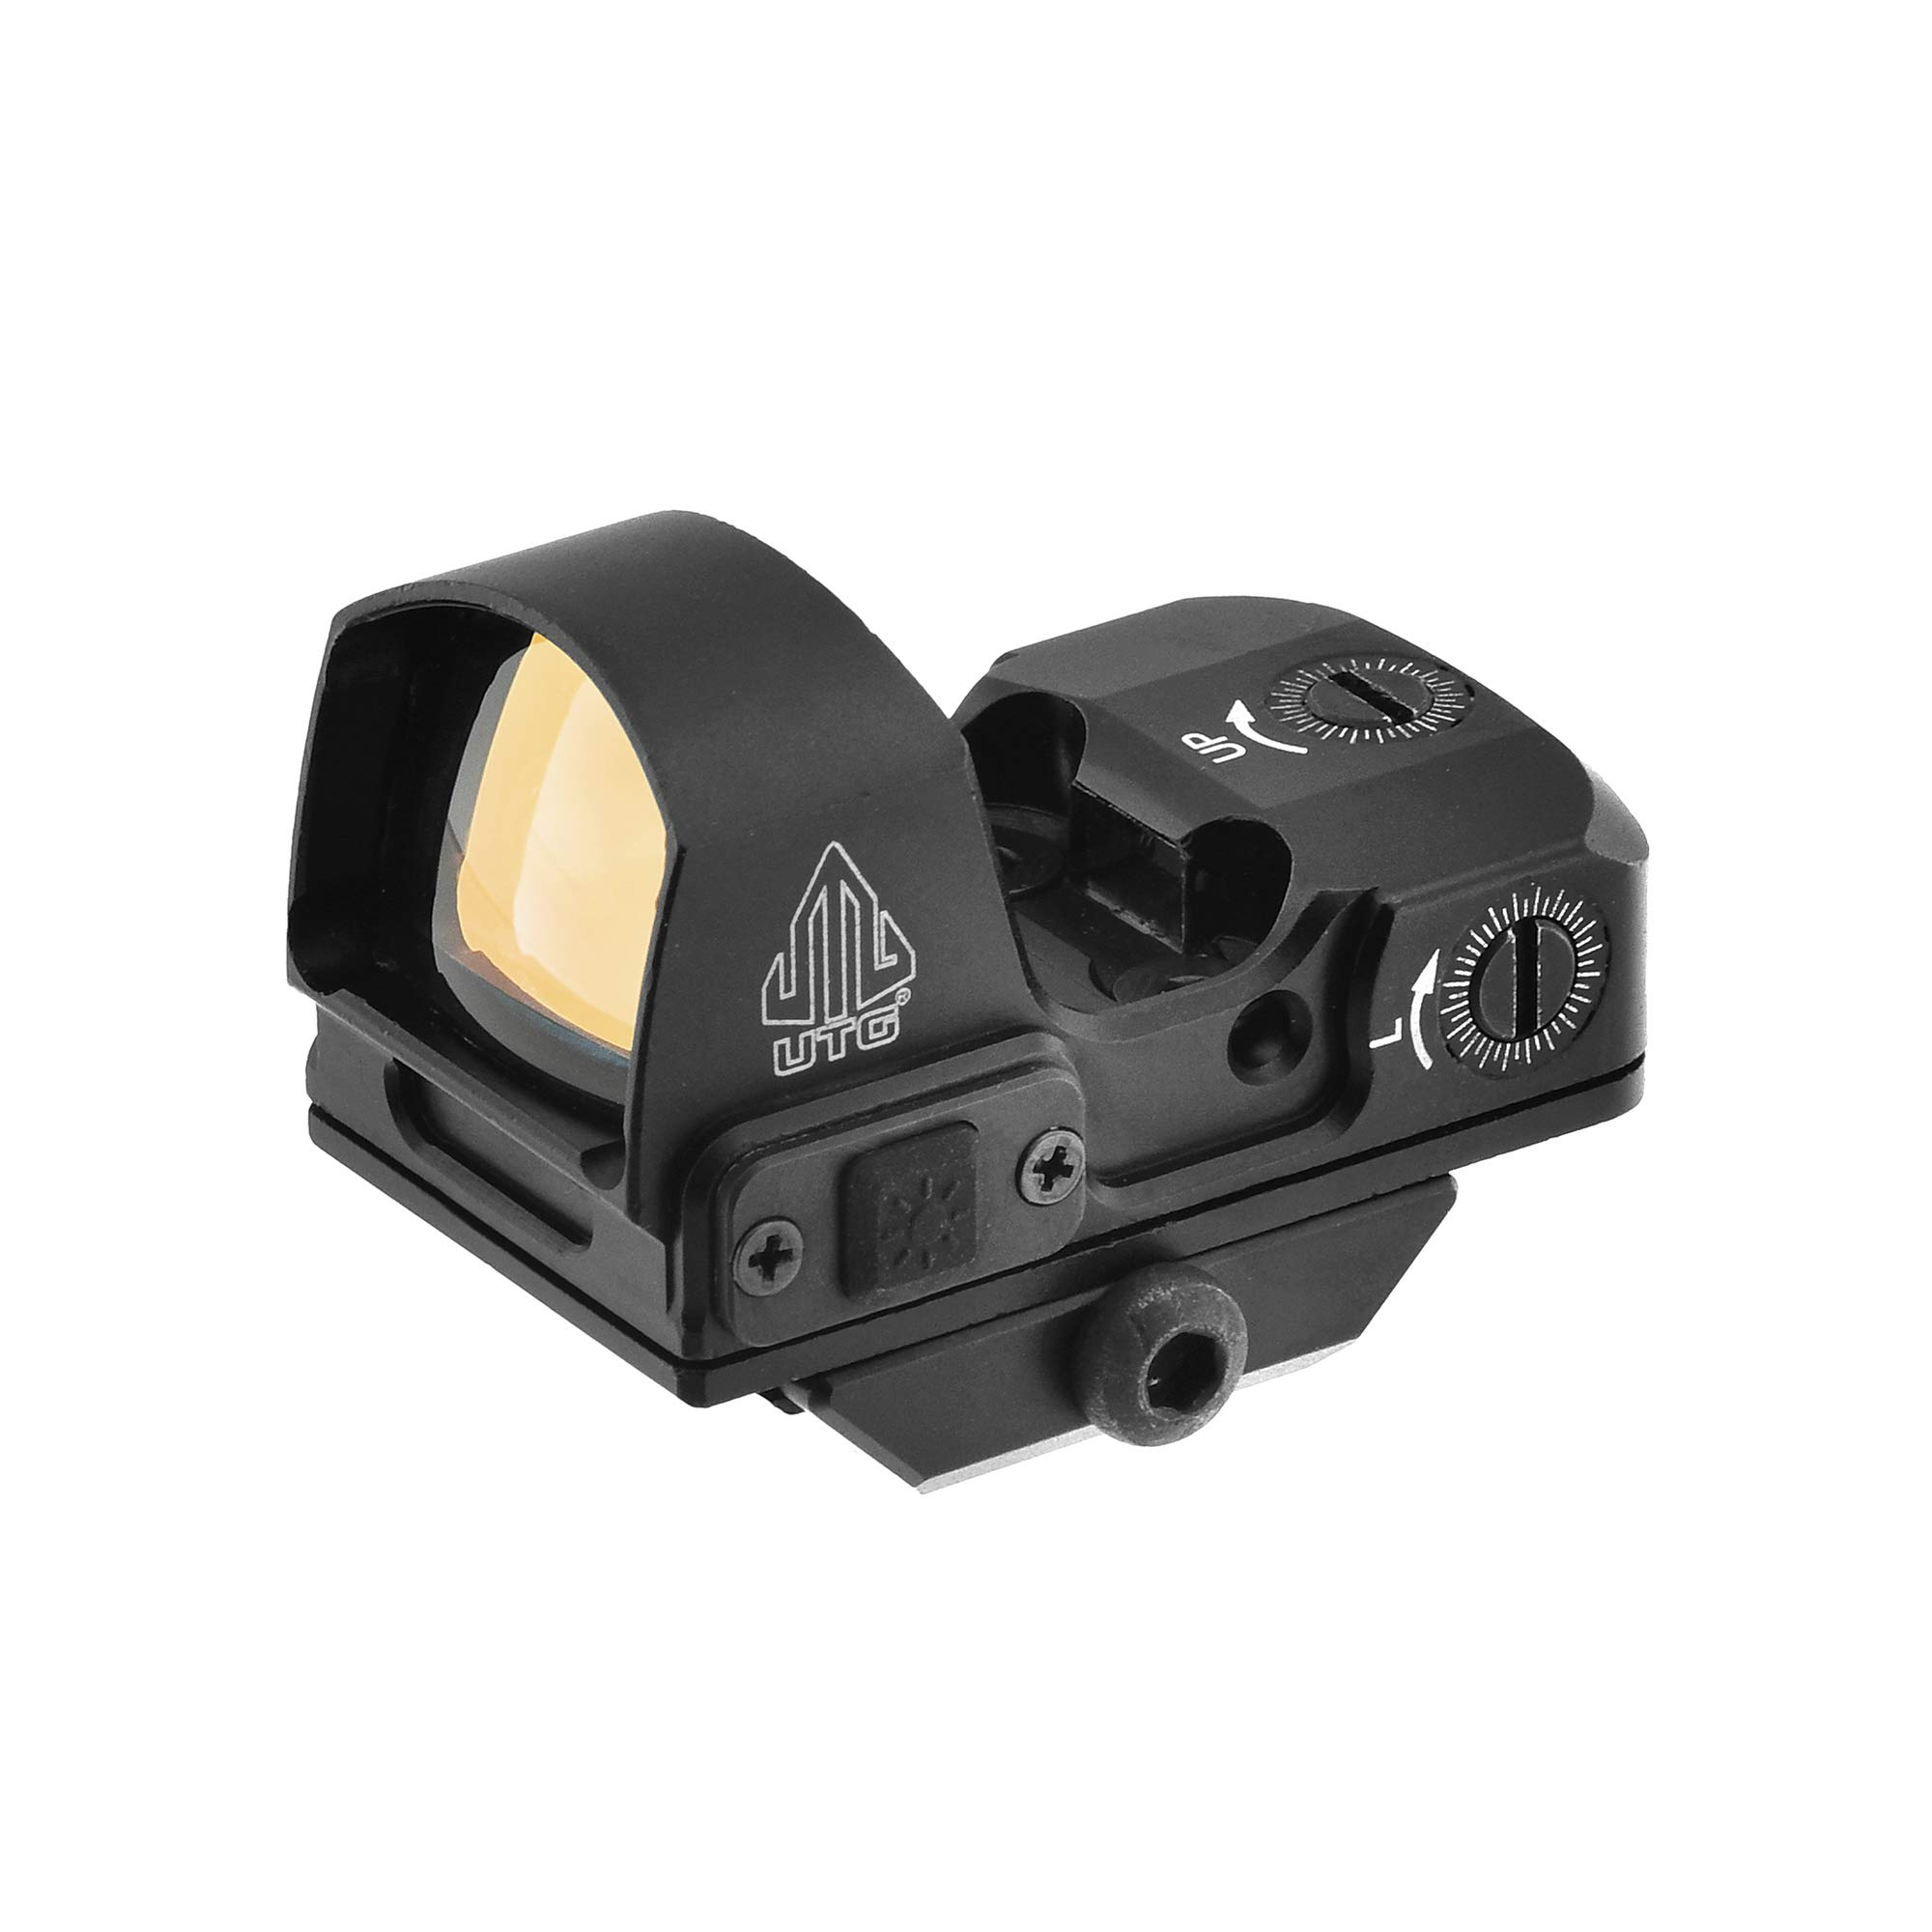 UTG Reflex Micro Dot Sight RED DOT 4 MOA Adaptive/picatinny base SCP-RDM20R